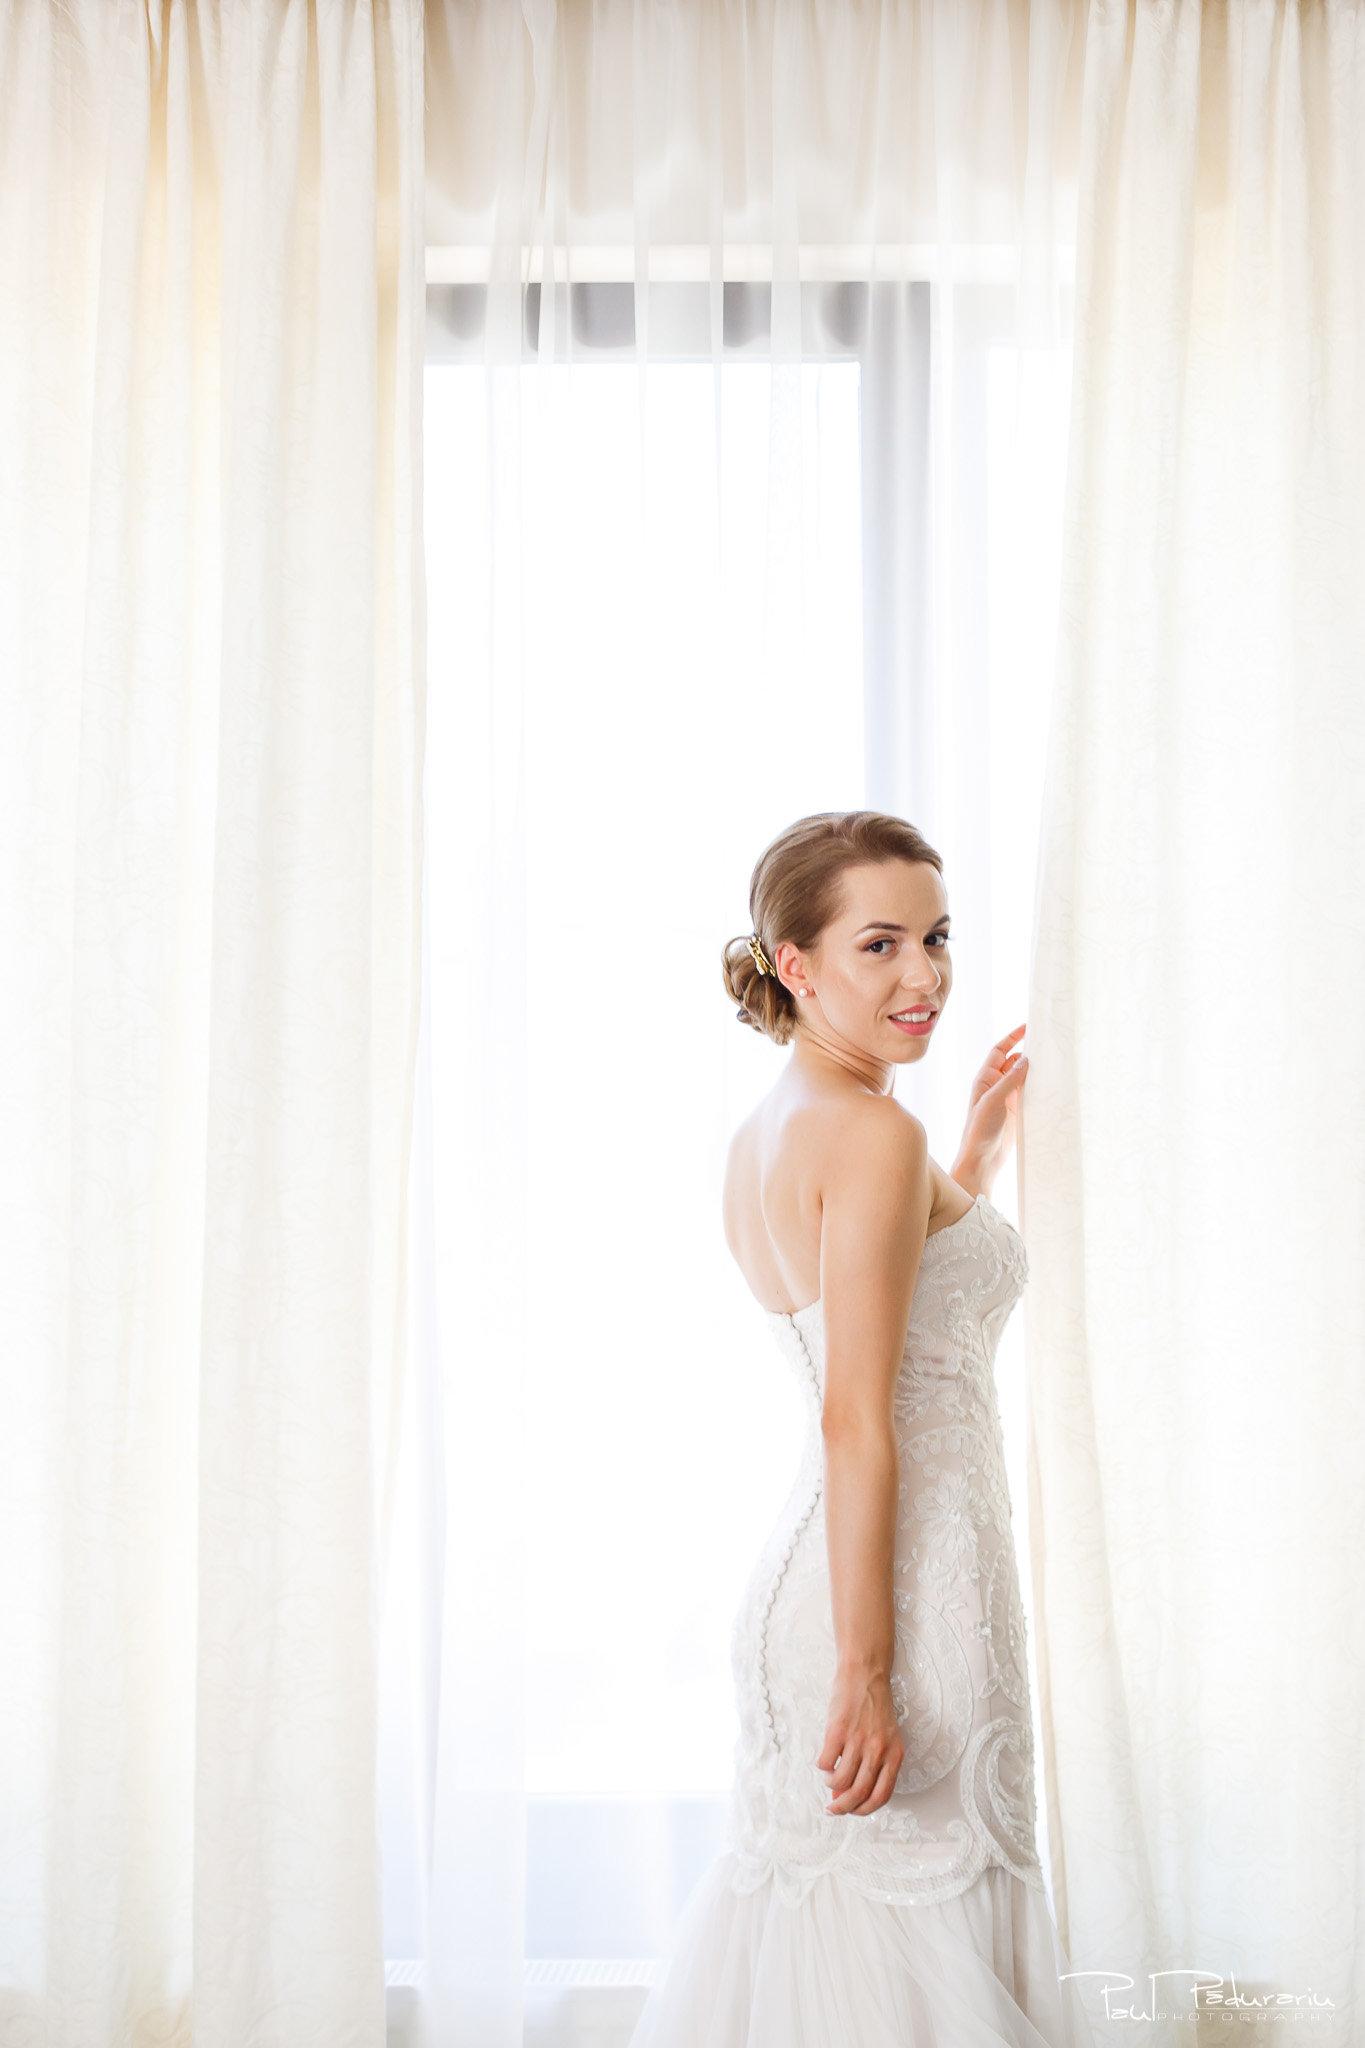 Roxana si Silviu Nunta Hotel Eden Iasi - pregatiri mireasa - fotograf profesionist nunta www.paulpadurariu.ro © 2017 Paul Padurariu